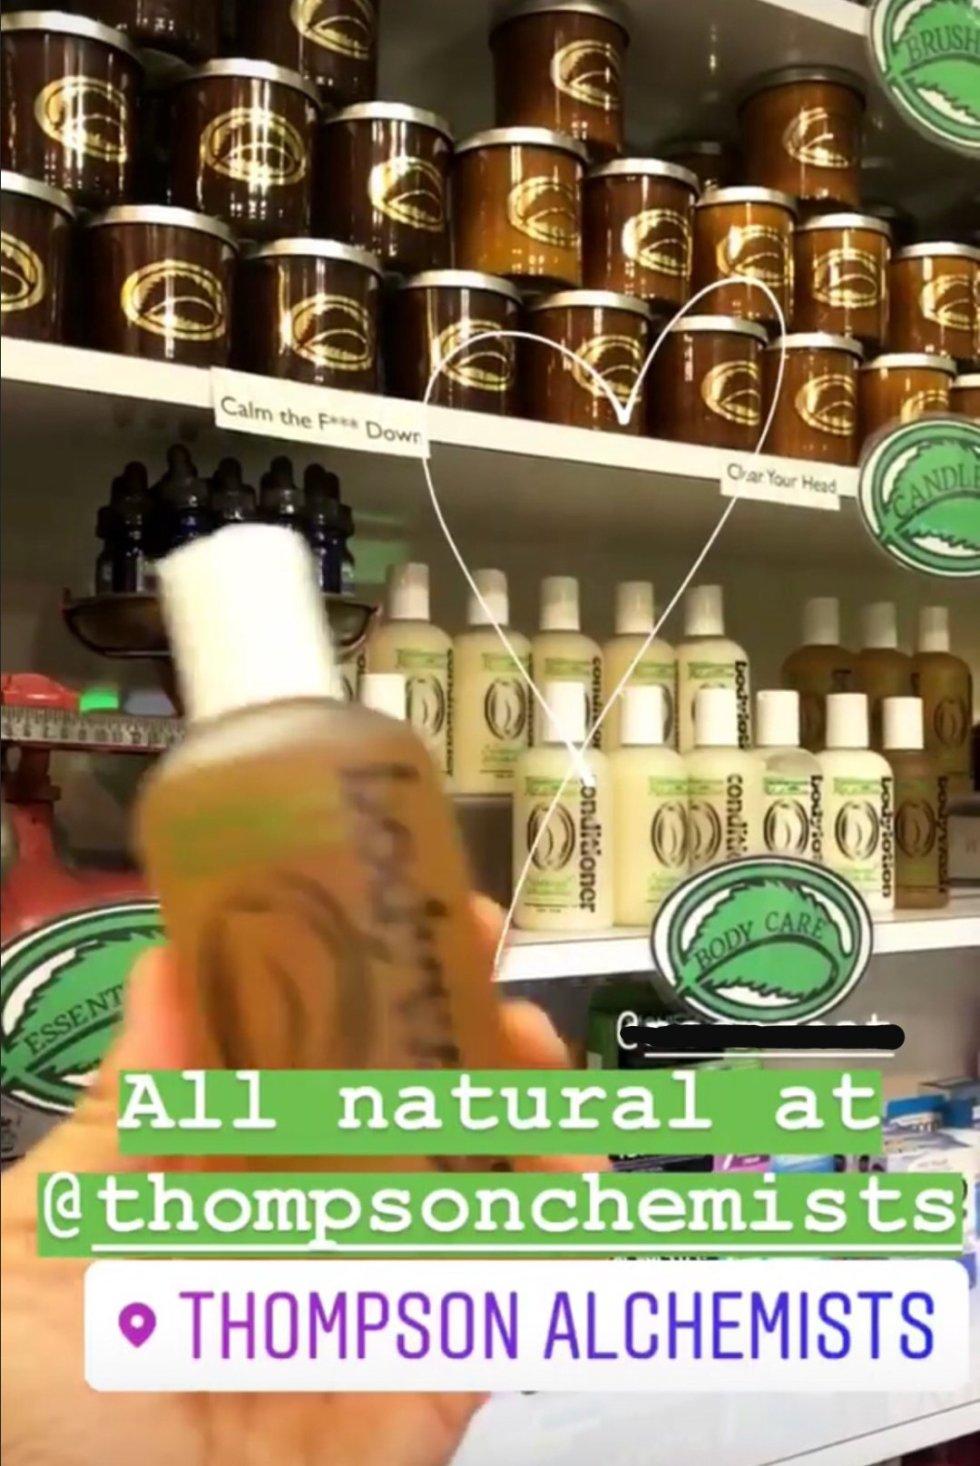 Thompson Alchemists Brand